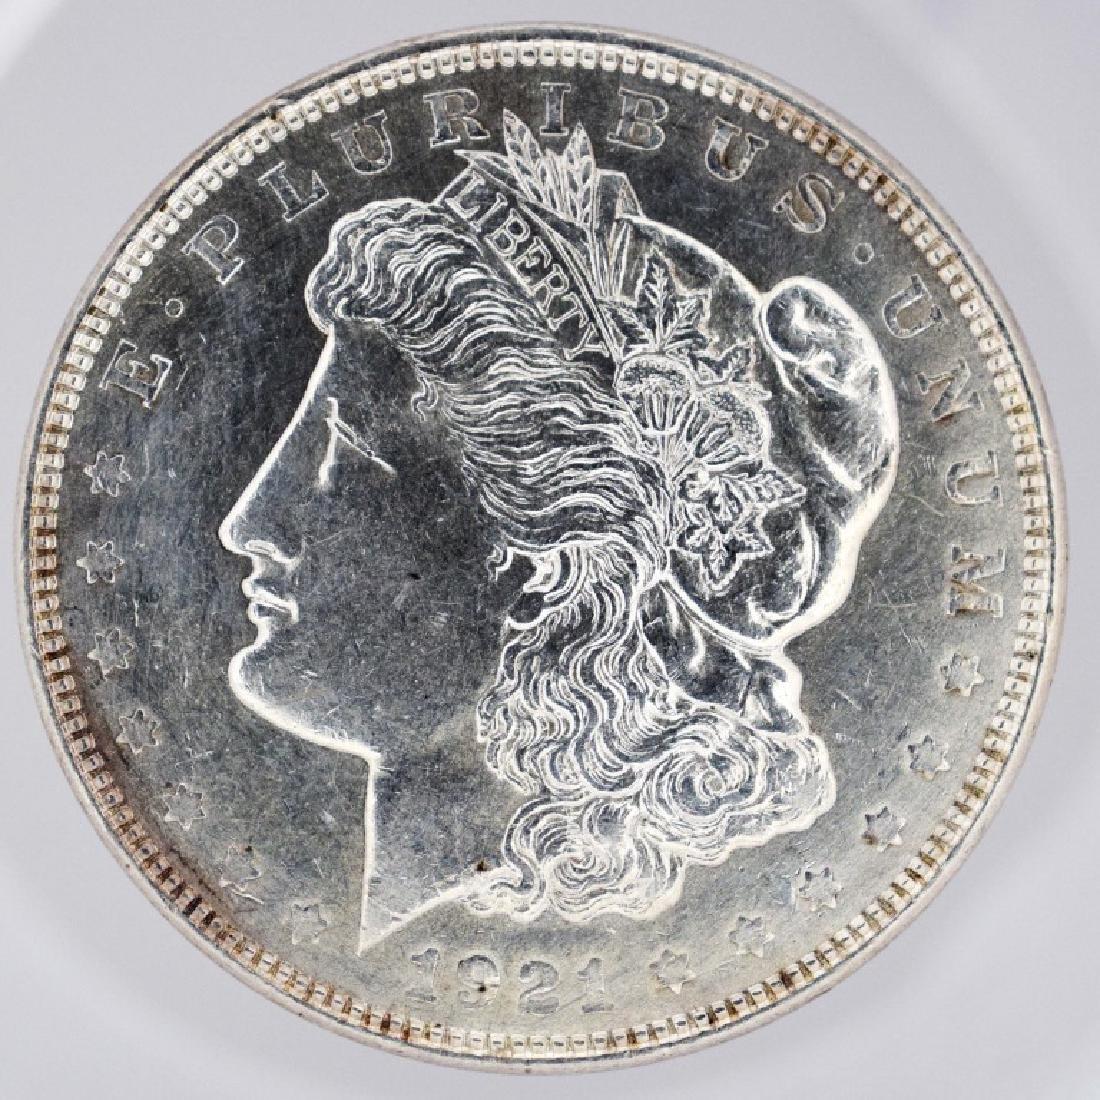 1921 Morgan Silver Dollar Bad Press on lower Obverse